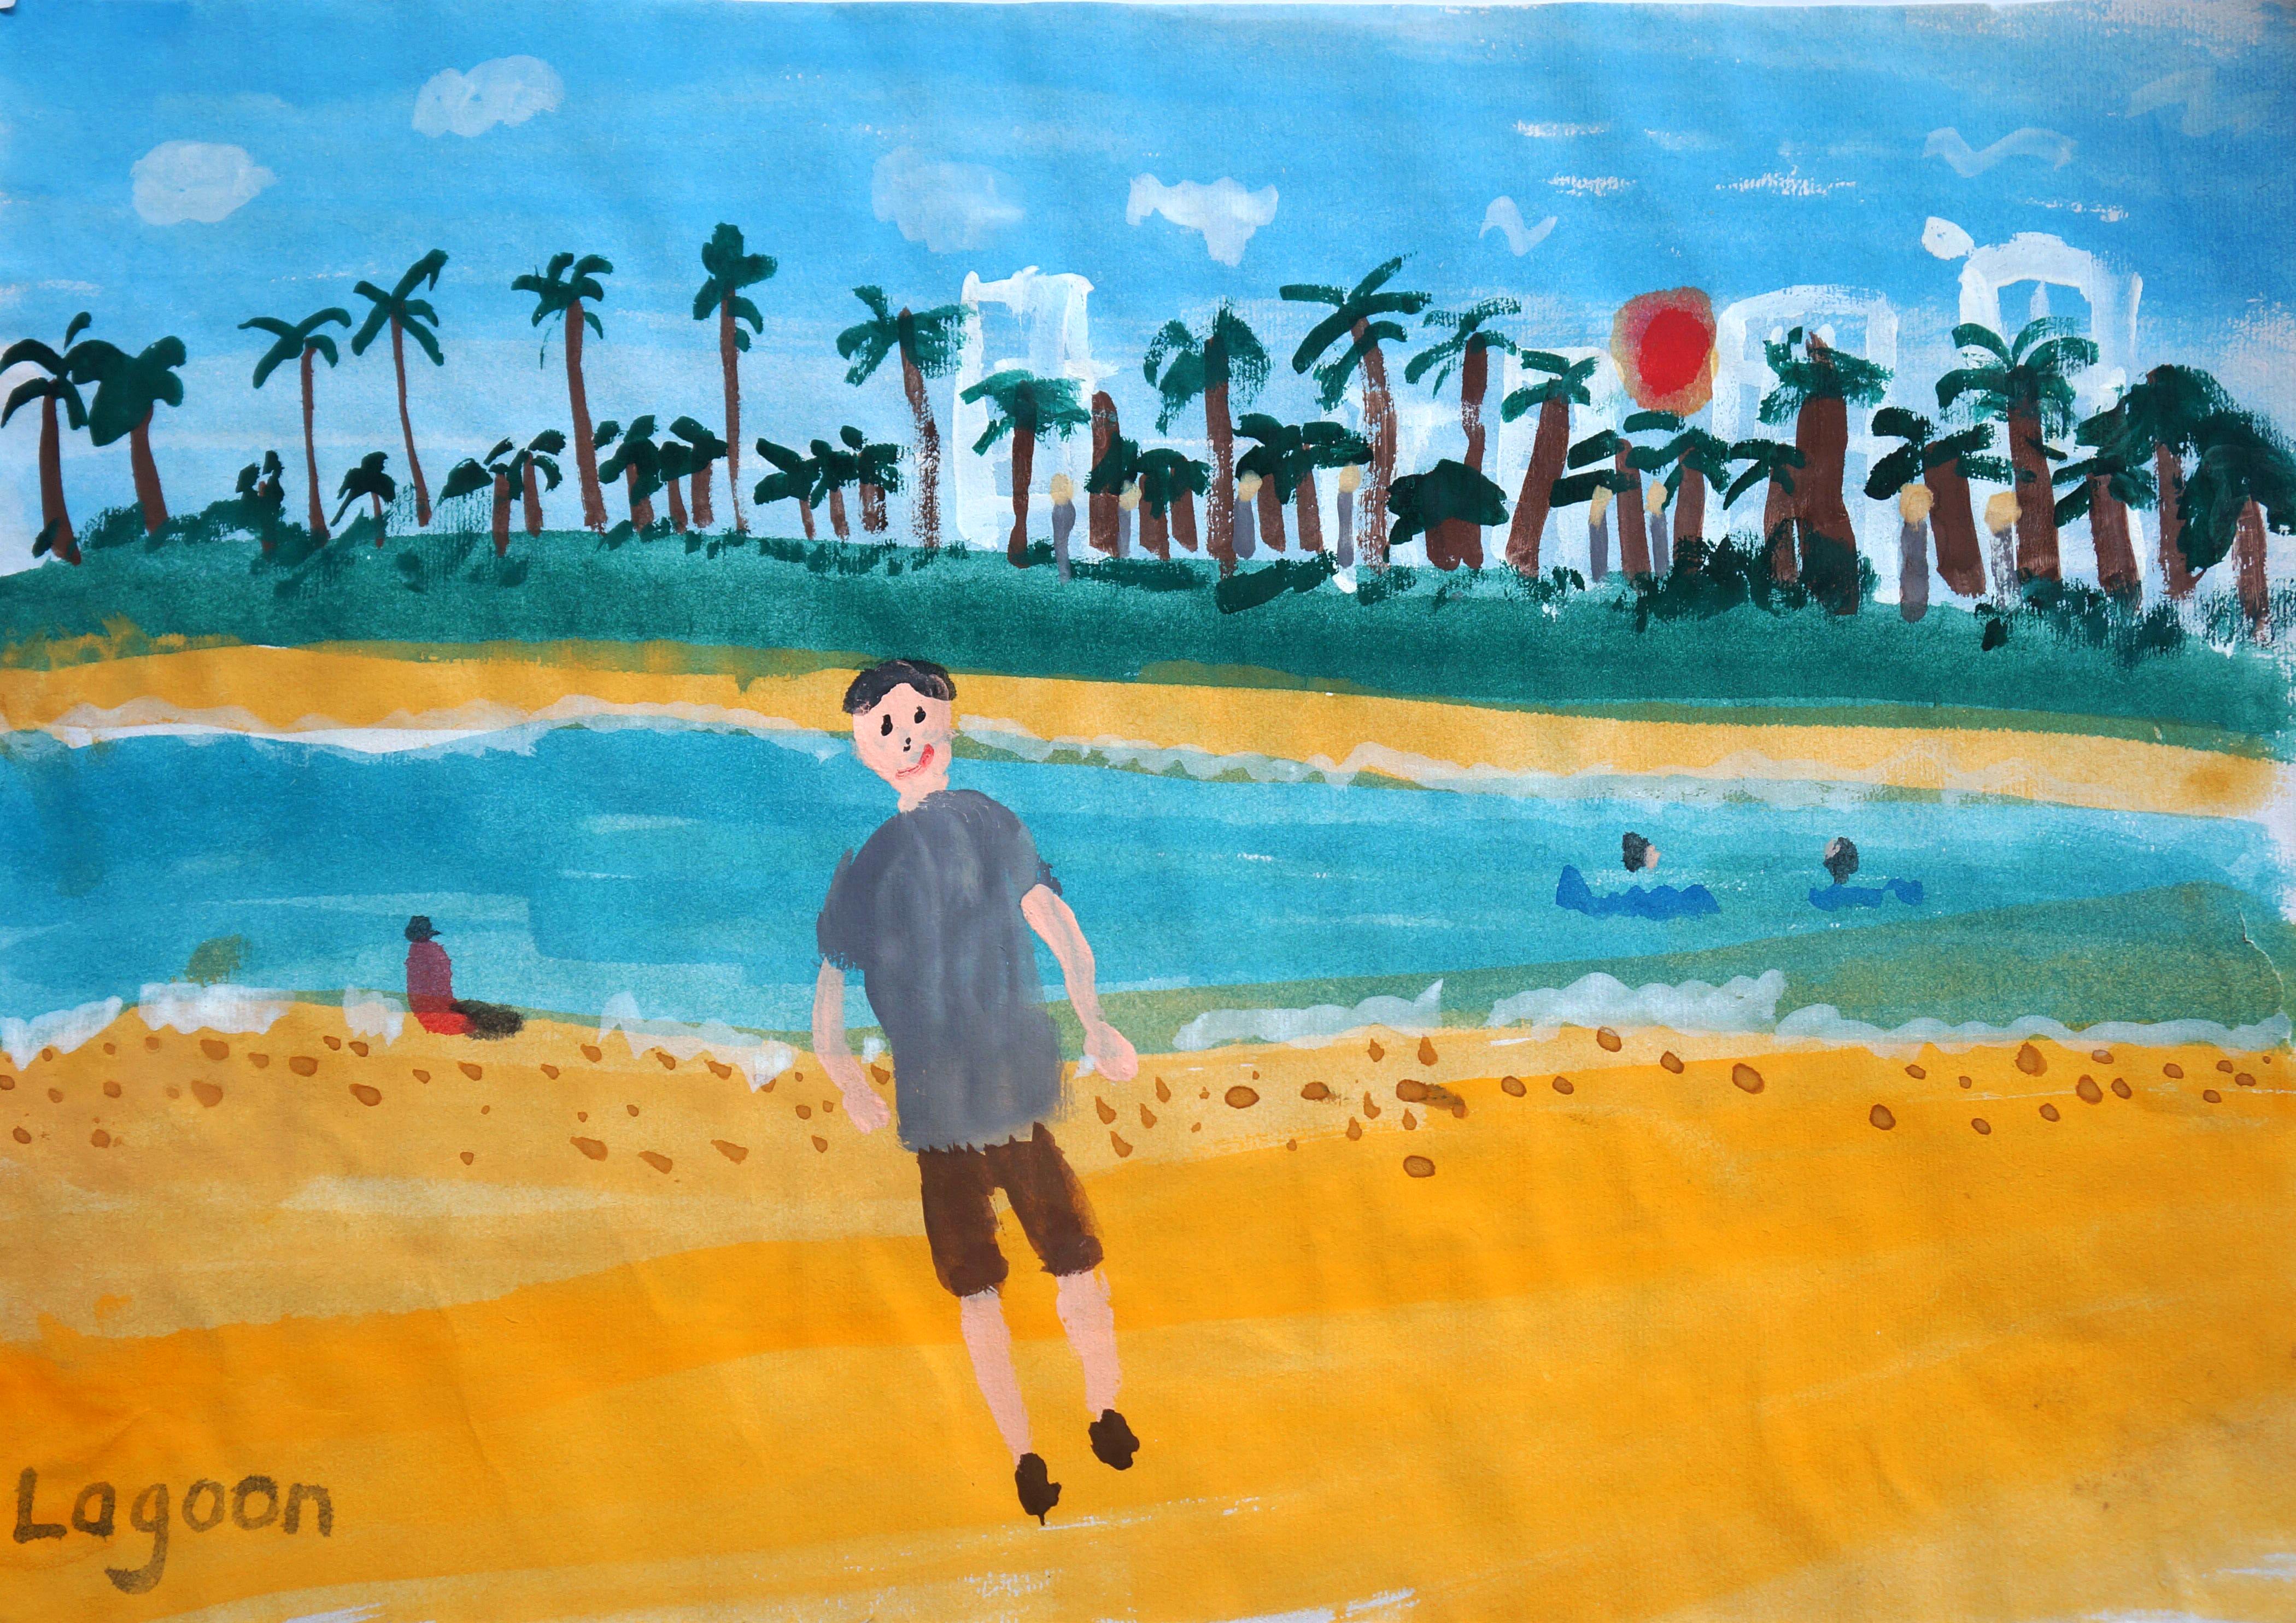 Chen Yitong--Hawaii, The Lagooon - Autism Artism 2017